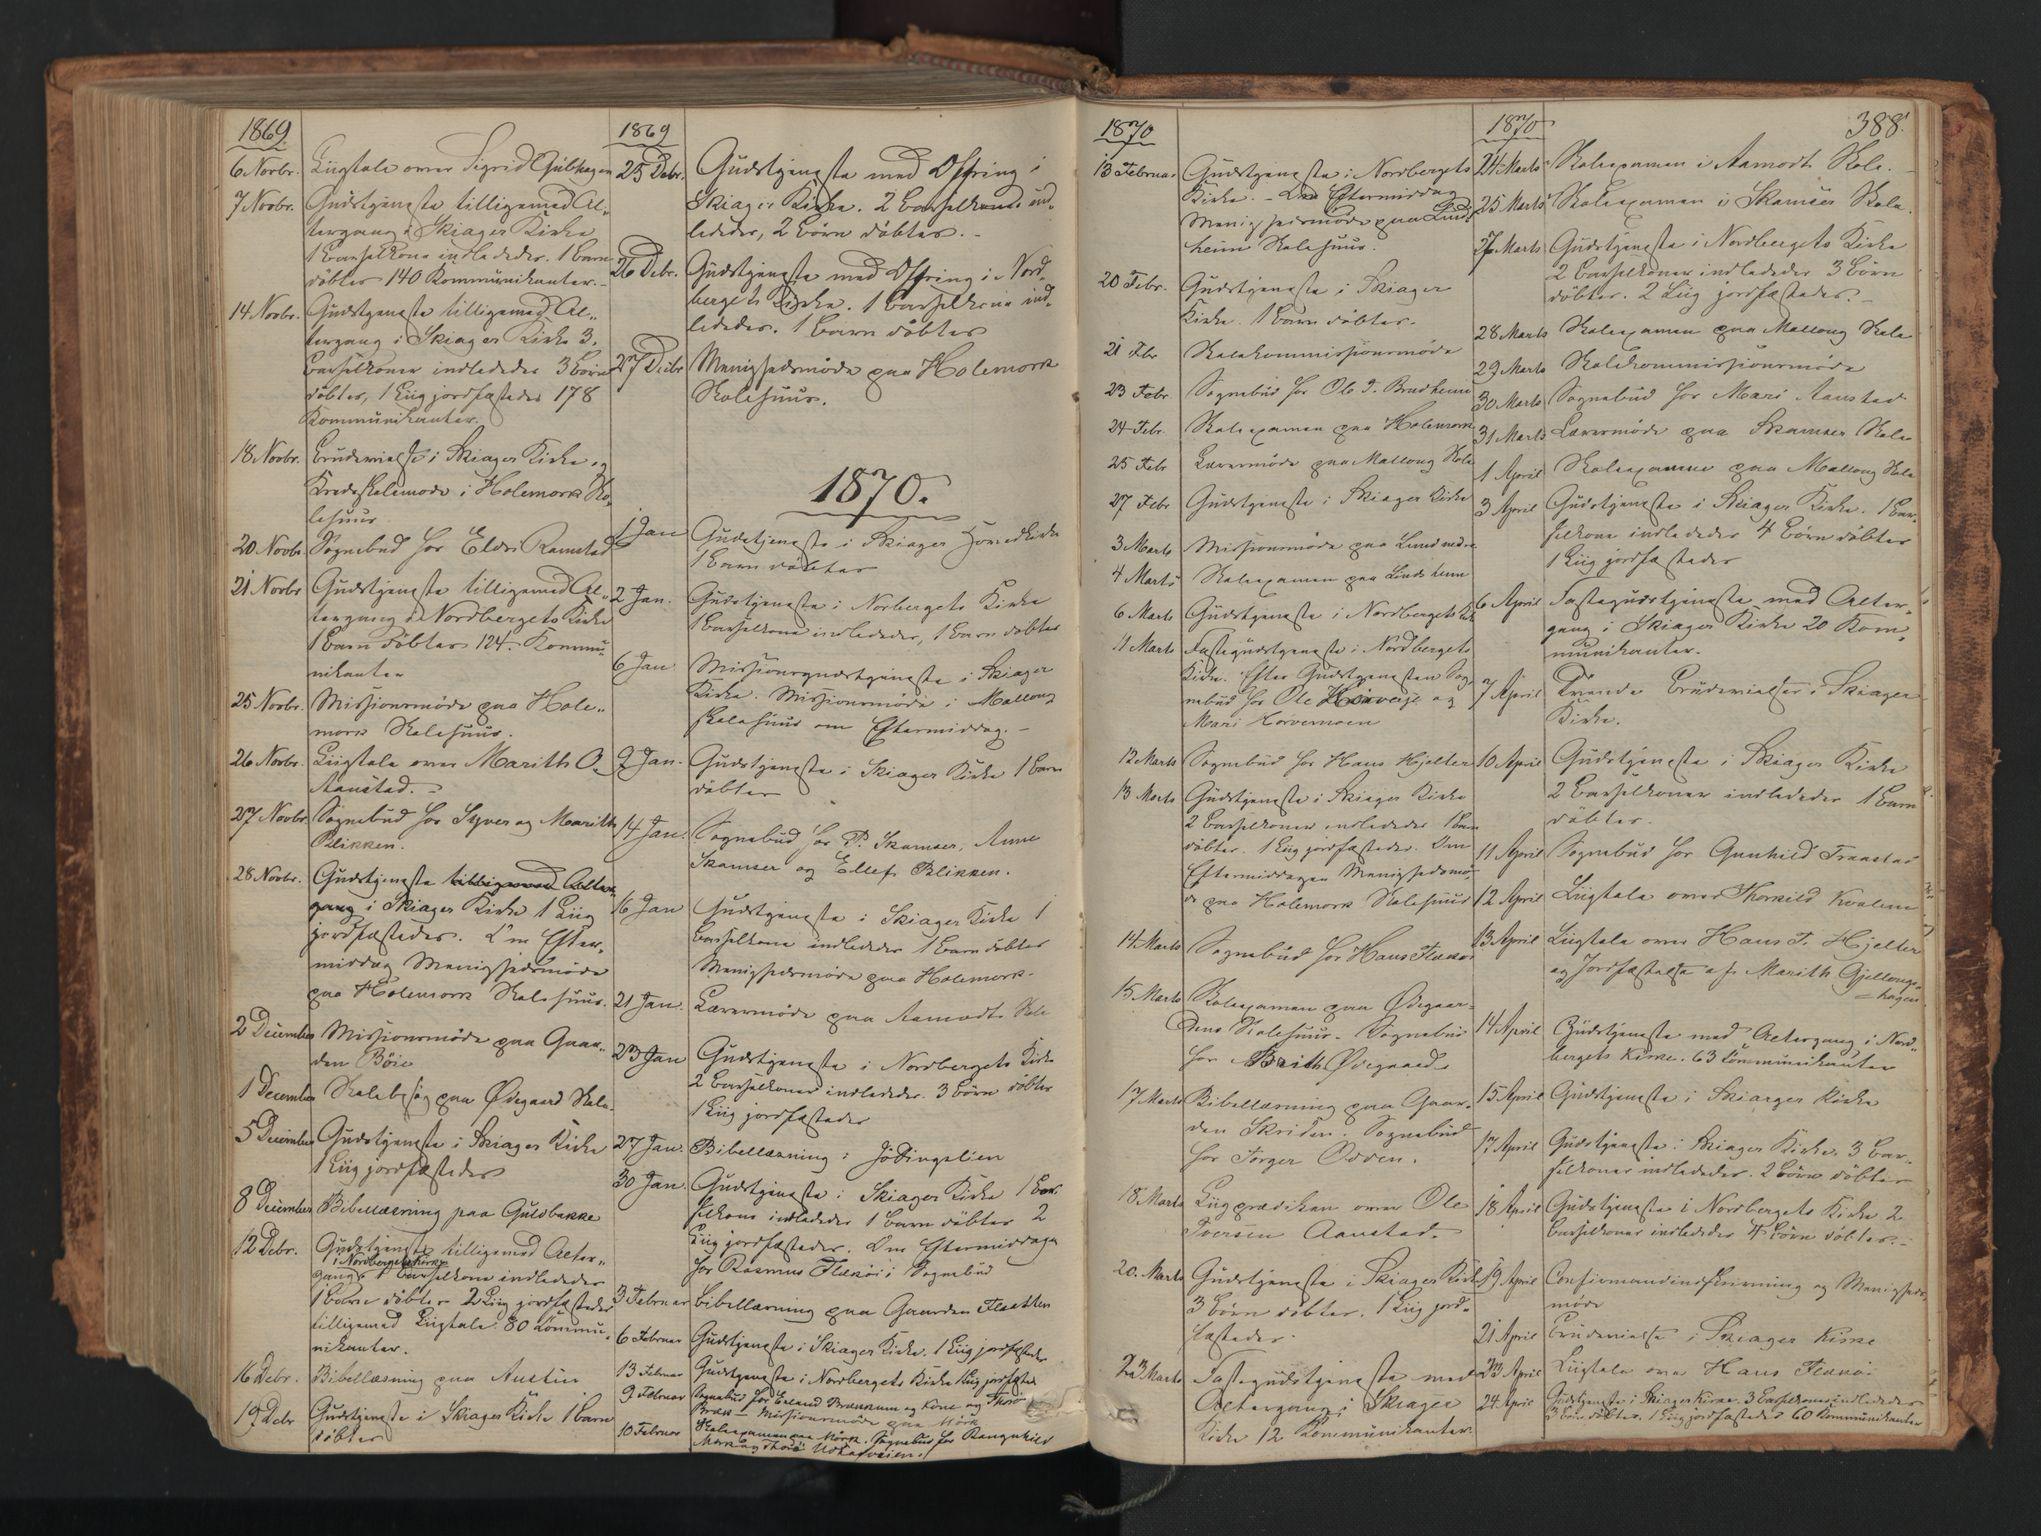 SAH, Skjåk prestekontor, Ministerialbok nr. 1, 1863-1879, s. 388